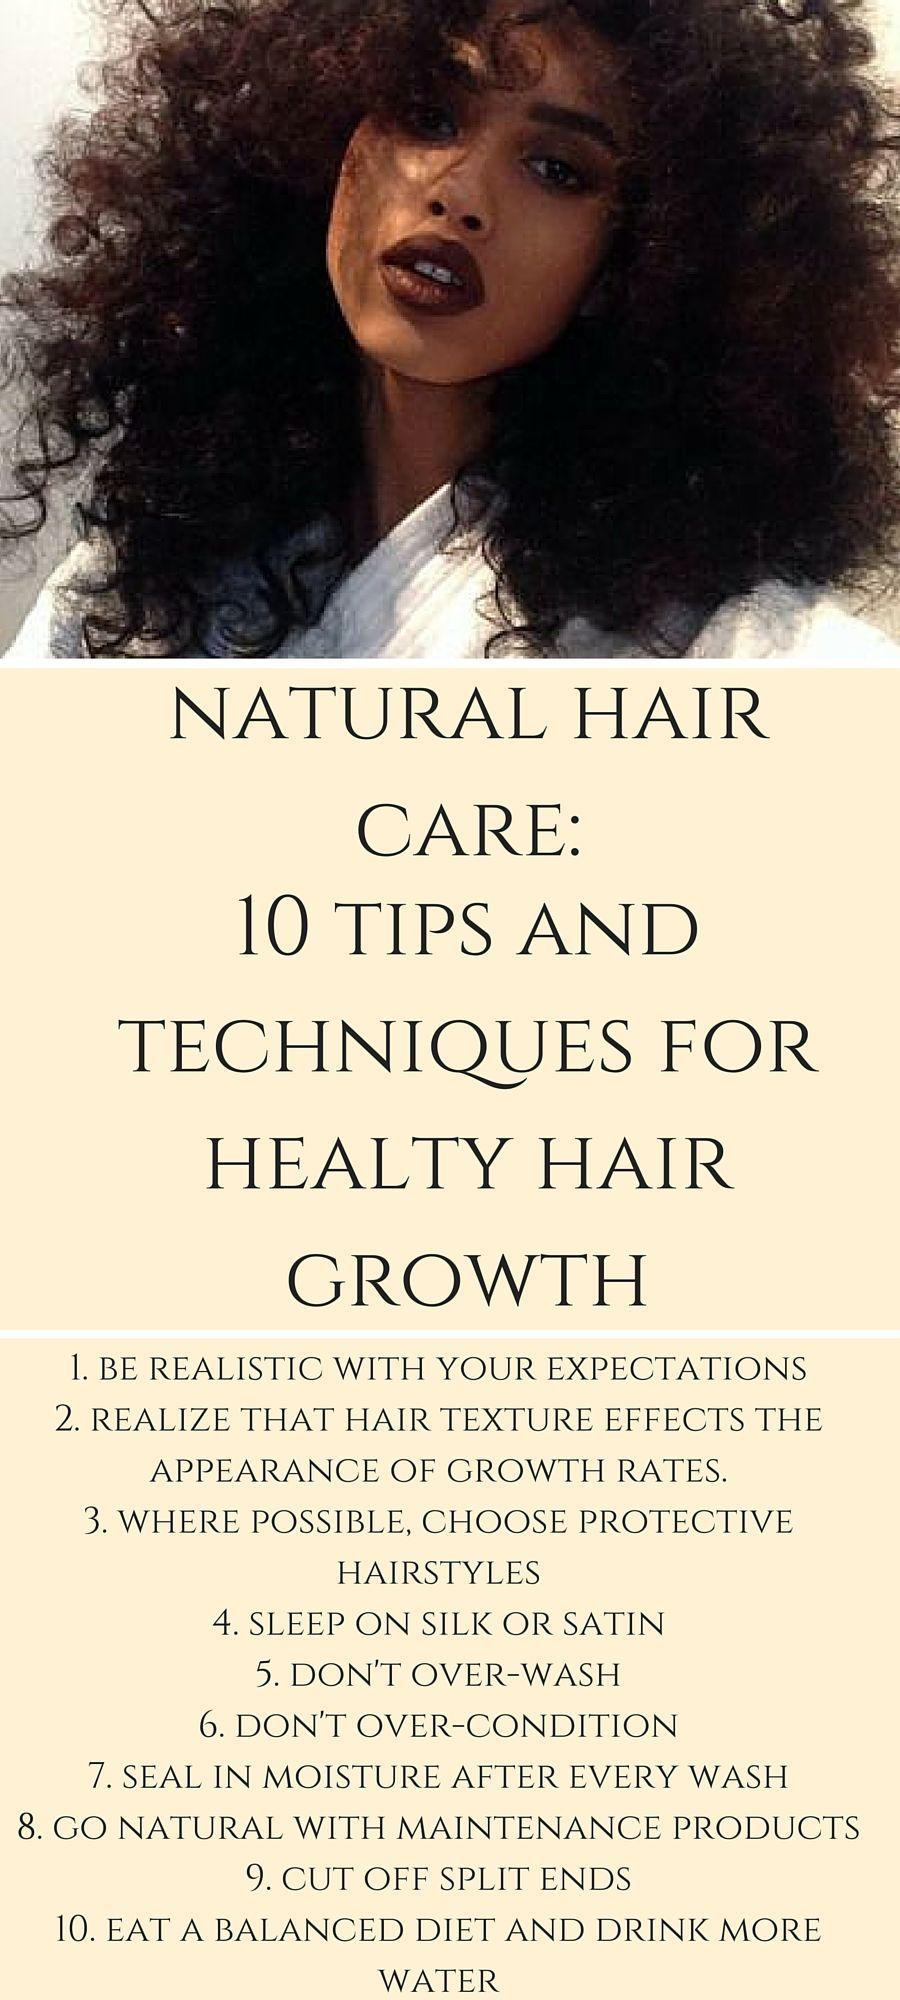 BeautyTipsForEyebrows Hair care tips, Hair care growth